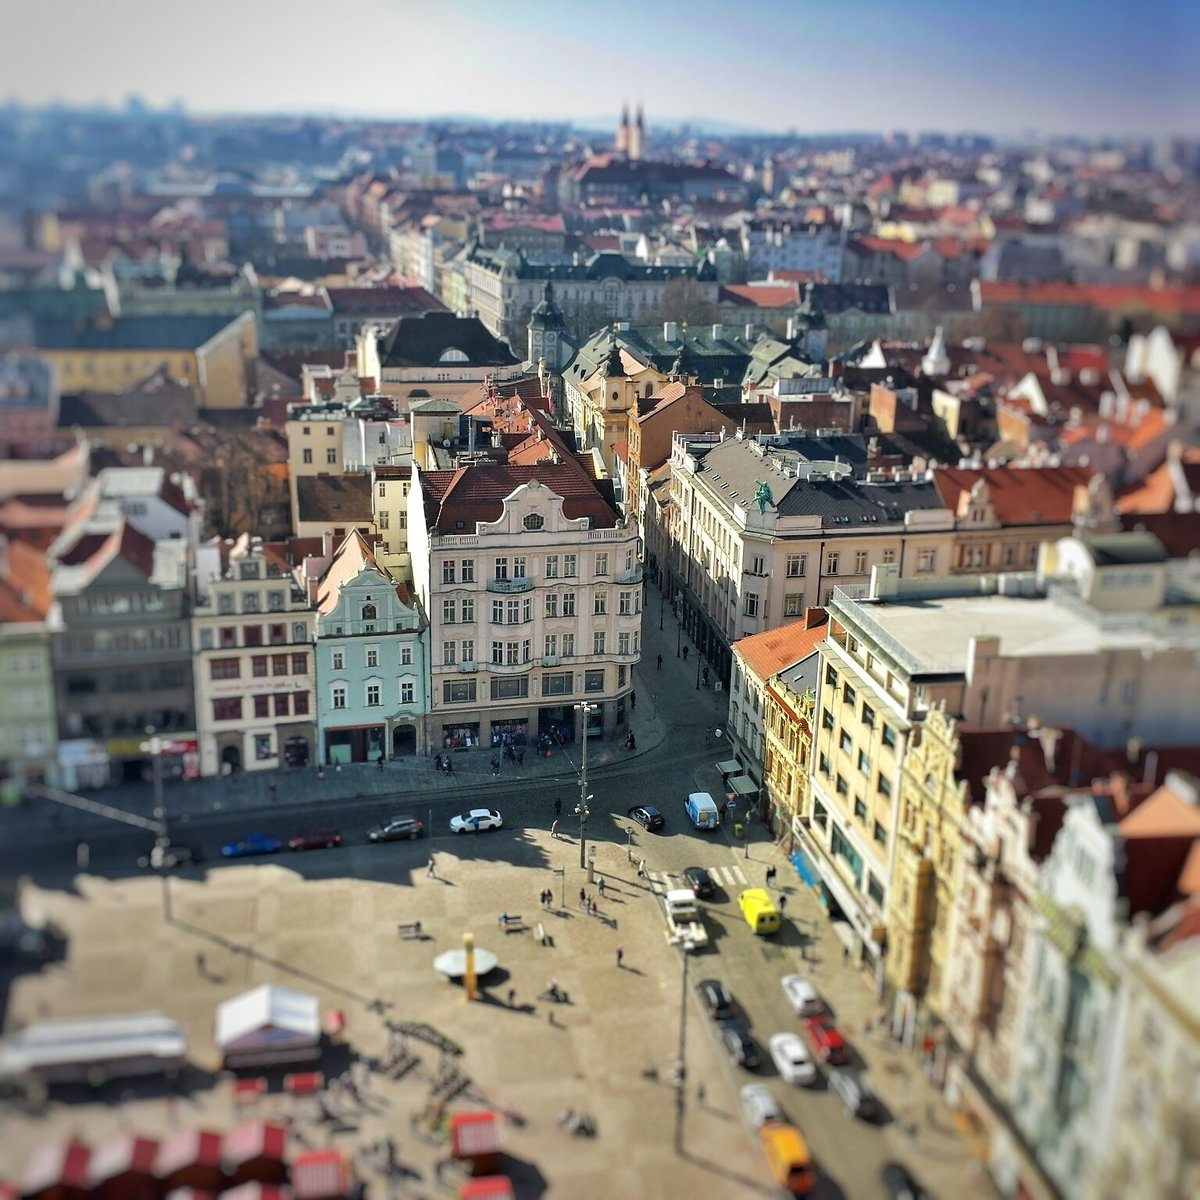 Exploring the city of Pilsen, birth place of lager #beer, today #plzen2015 #visitcz @plzen2015 @CzechTourism #travel https://t.co/TceWAfX0PY